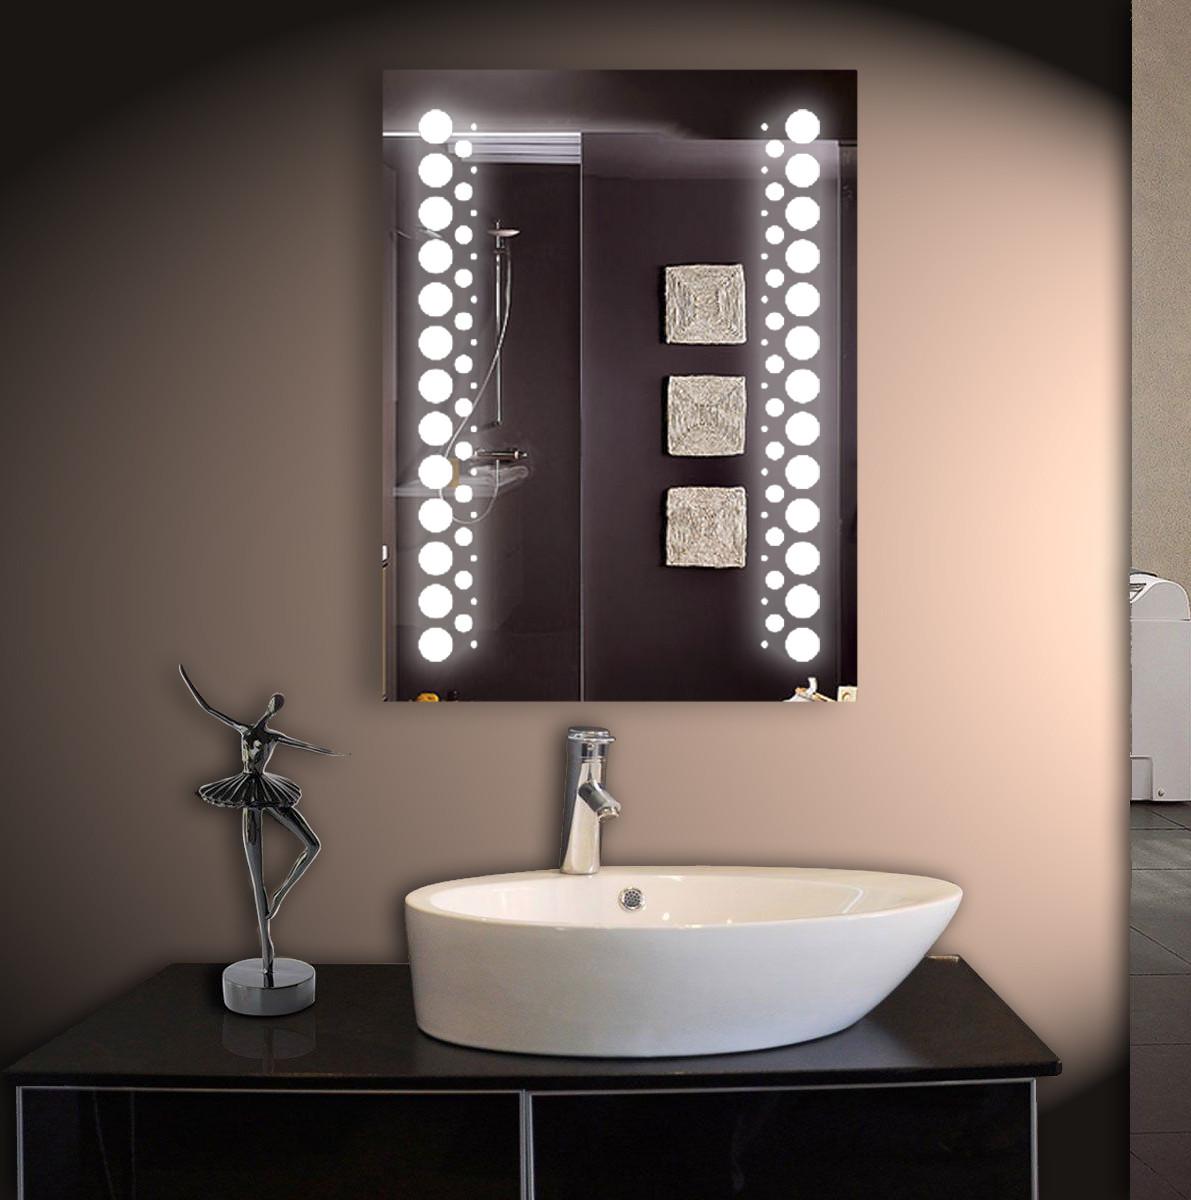 Зеркало LED со светодиодной подсветкой ver-3014 600х800 мм